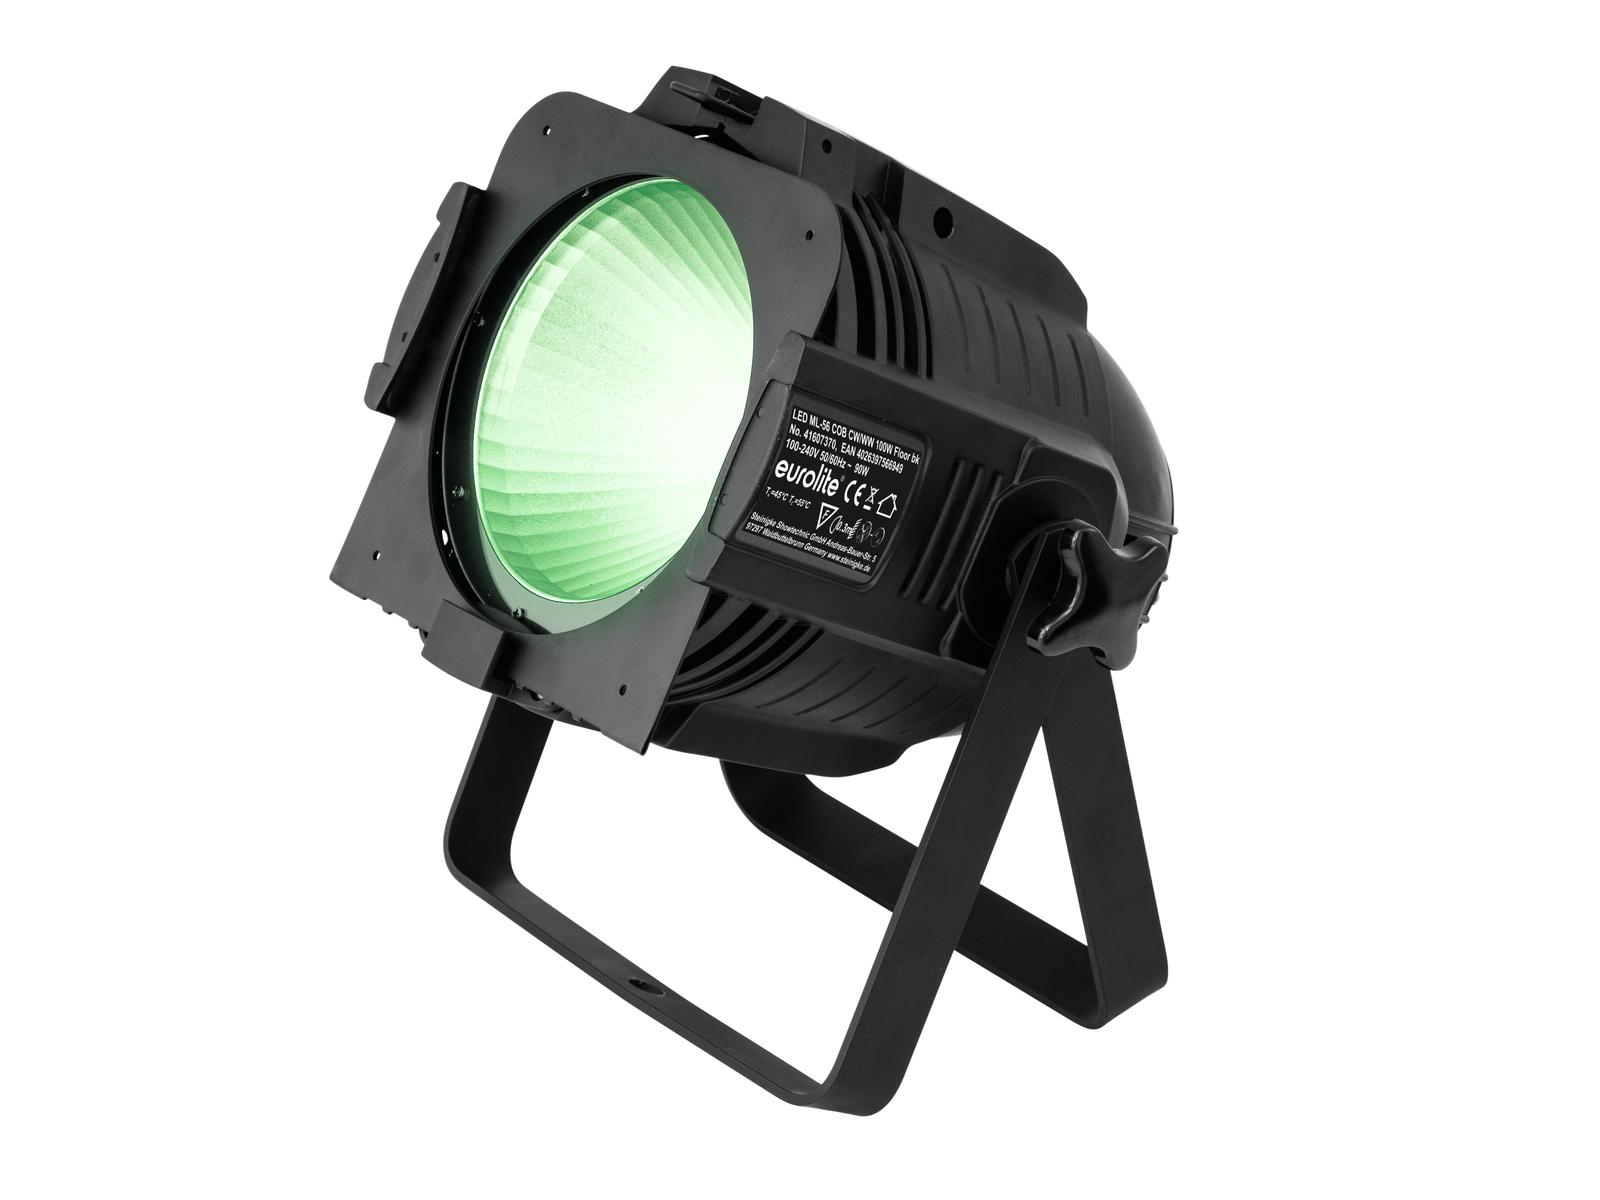 EUROLITE LED ML-56 COB RGBAW 100W Floor sw